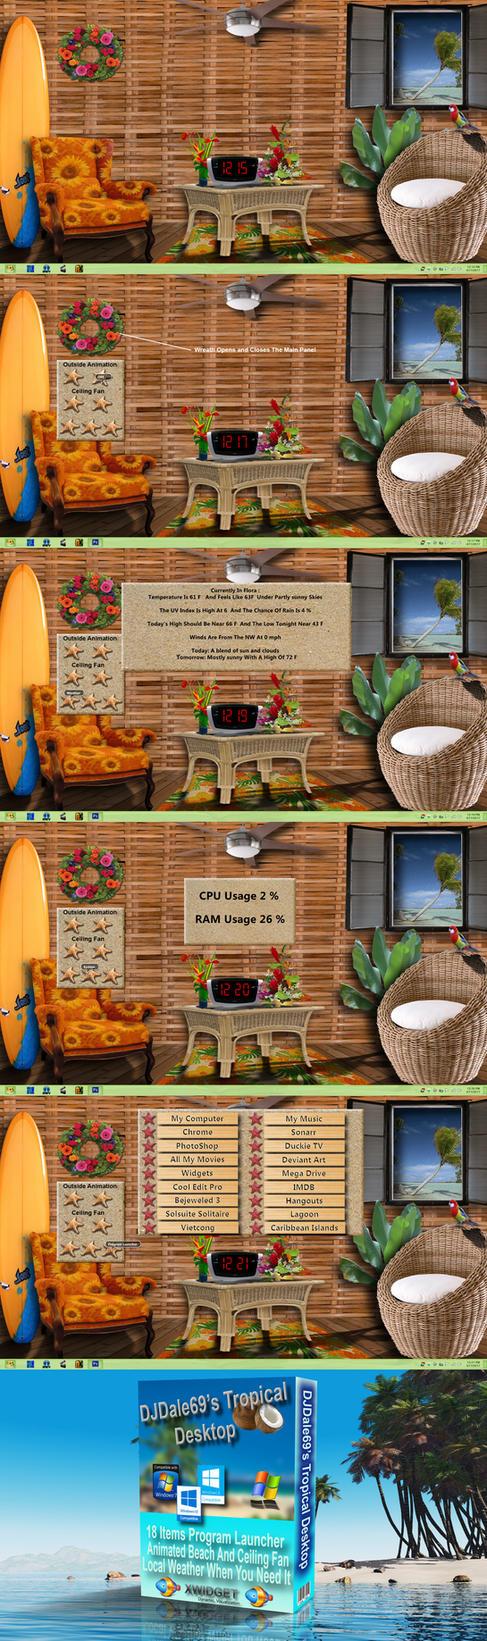 1366x768Tropical Desktop by DJDale69